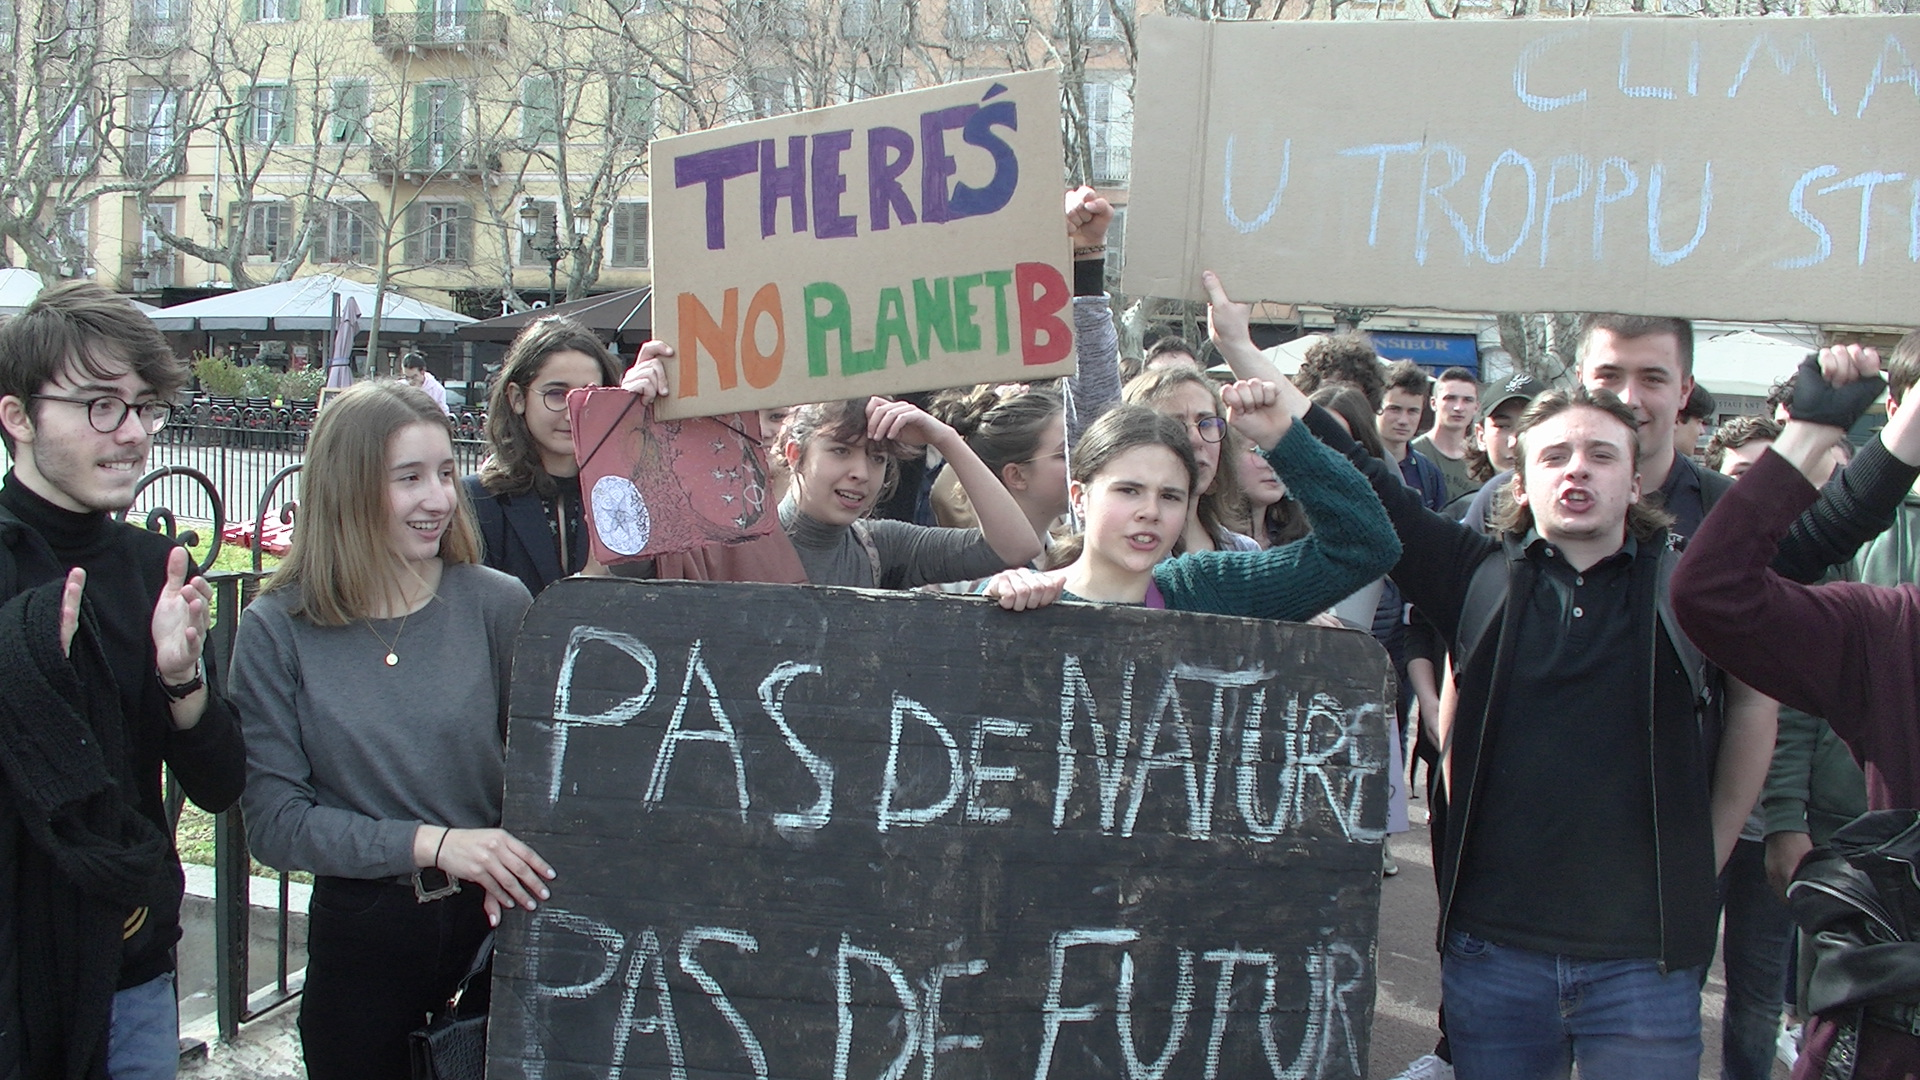 Image archives CNI, manifestation du 15 mars 2019 à Bastia